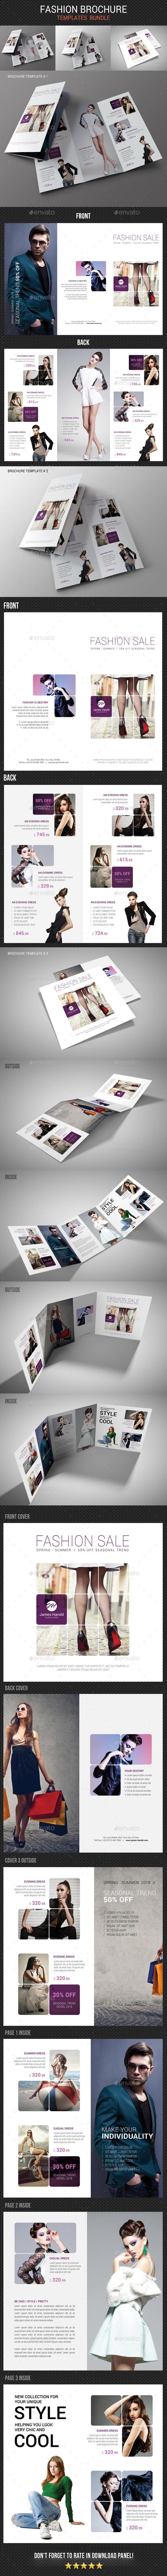 Fashion Brochure Bundle 3 - Brochures Print Templates